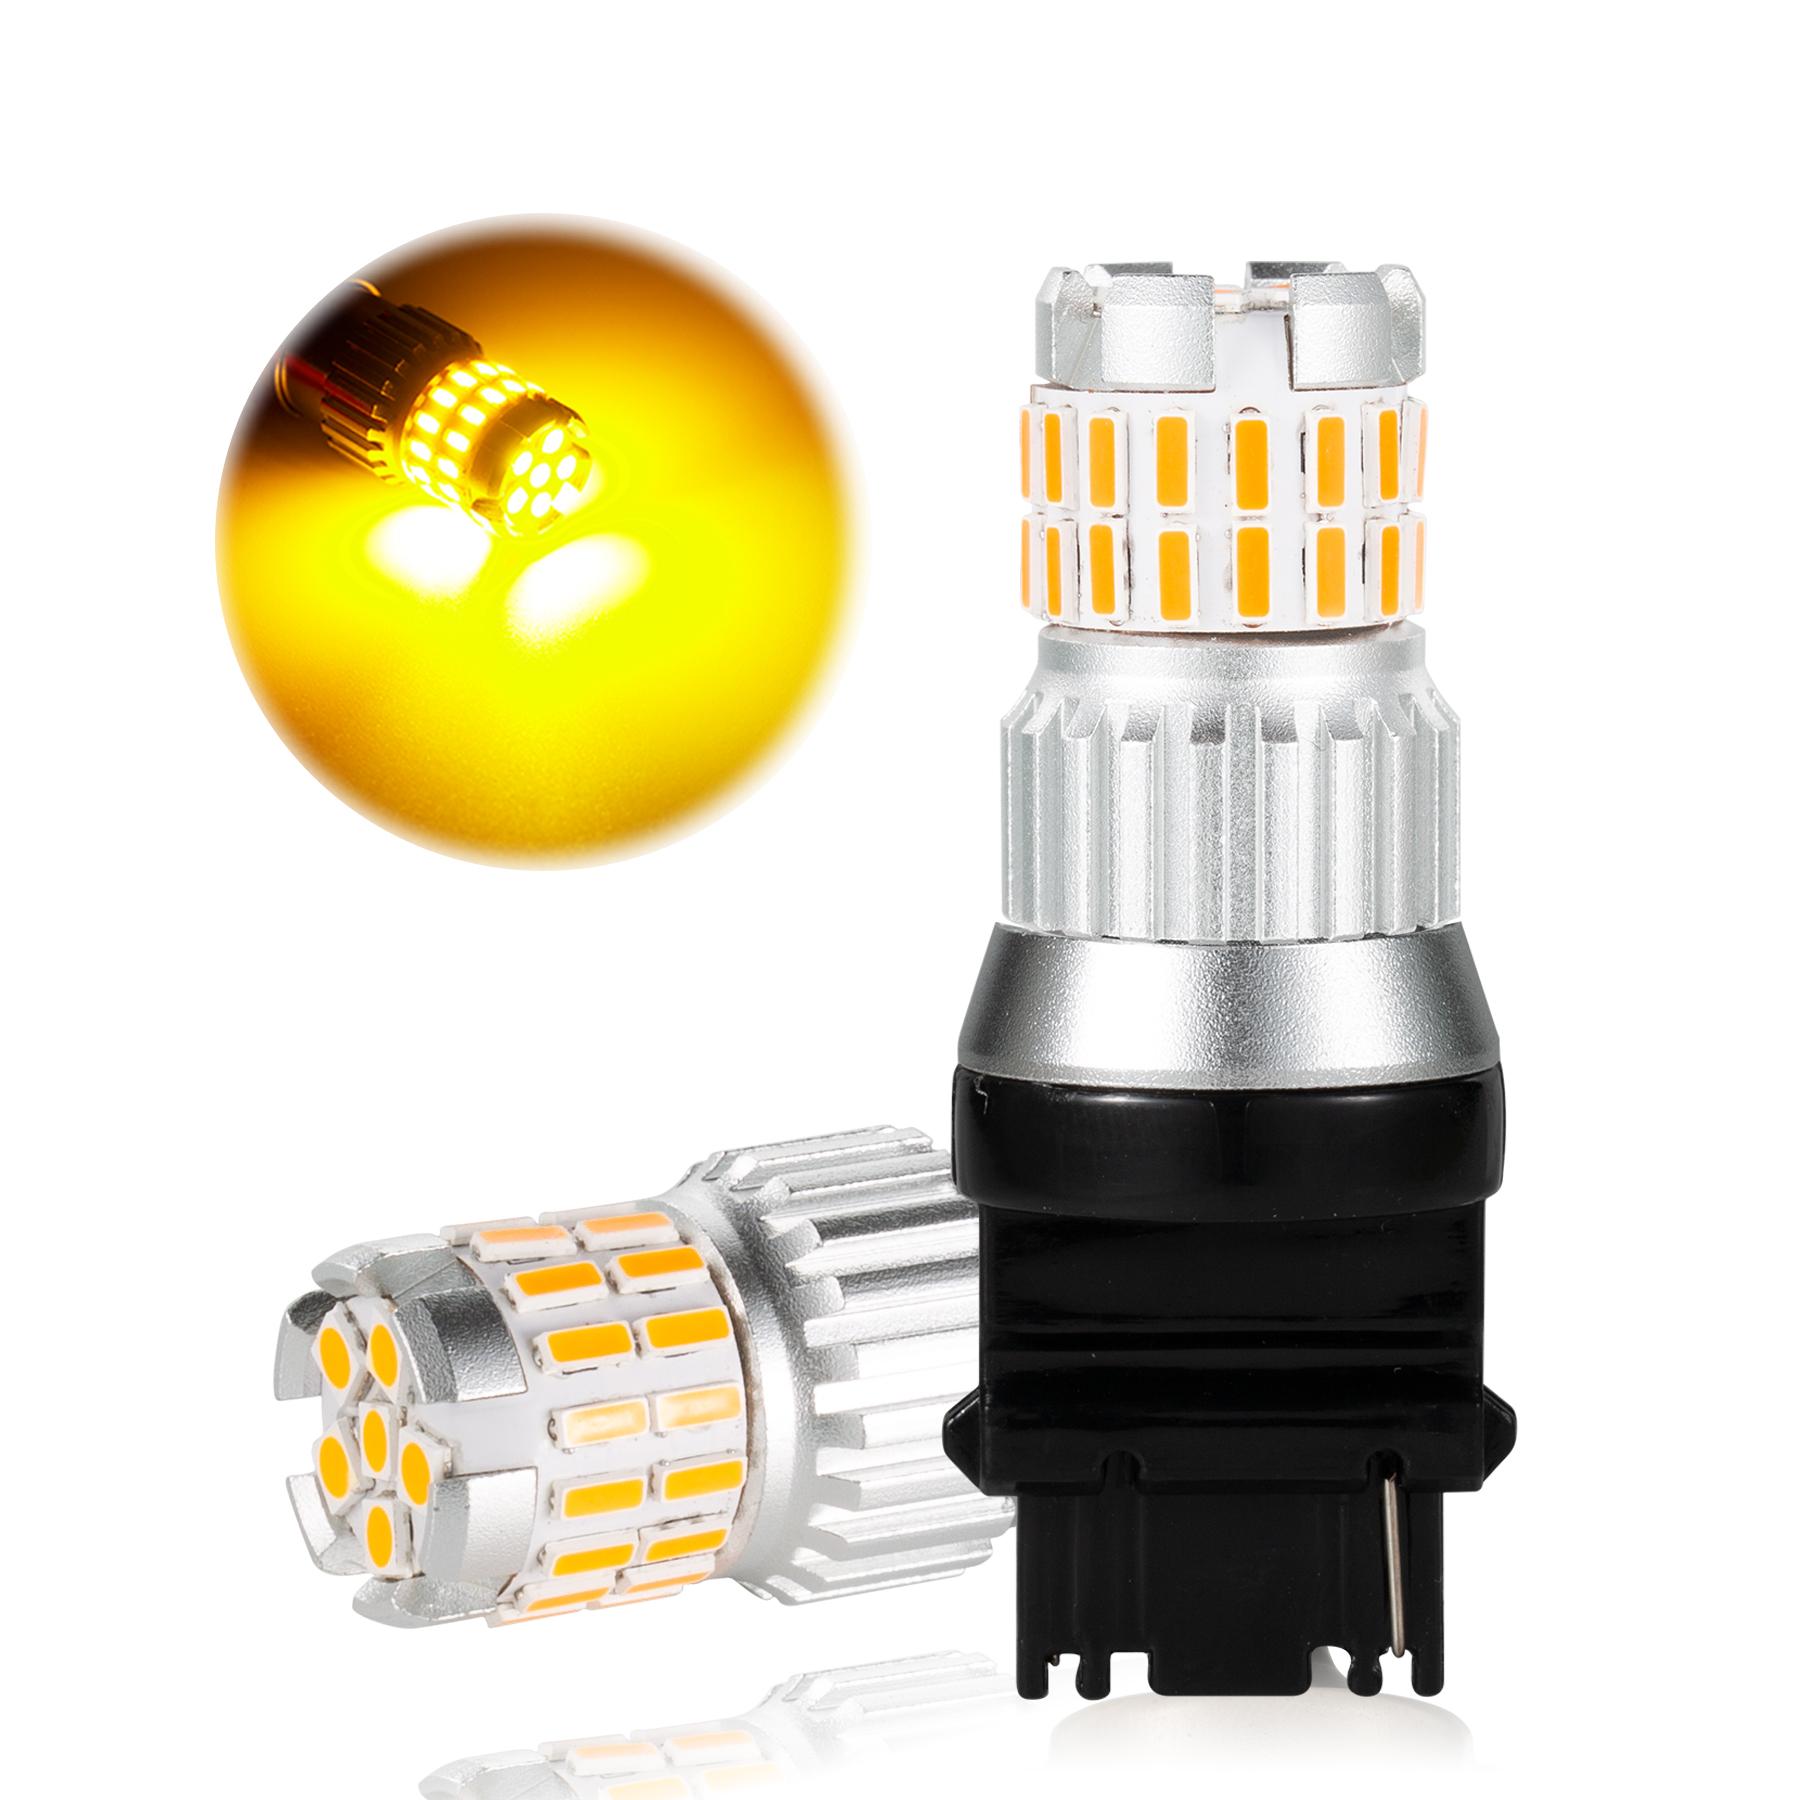 2pcs Fast Heat Dissipation LED Bulb for Car Canbus Waterproof Light 6500K   T25 yellow light